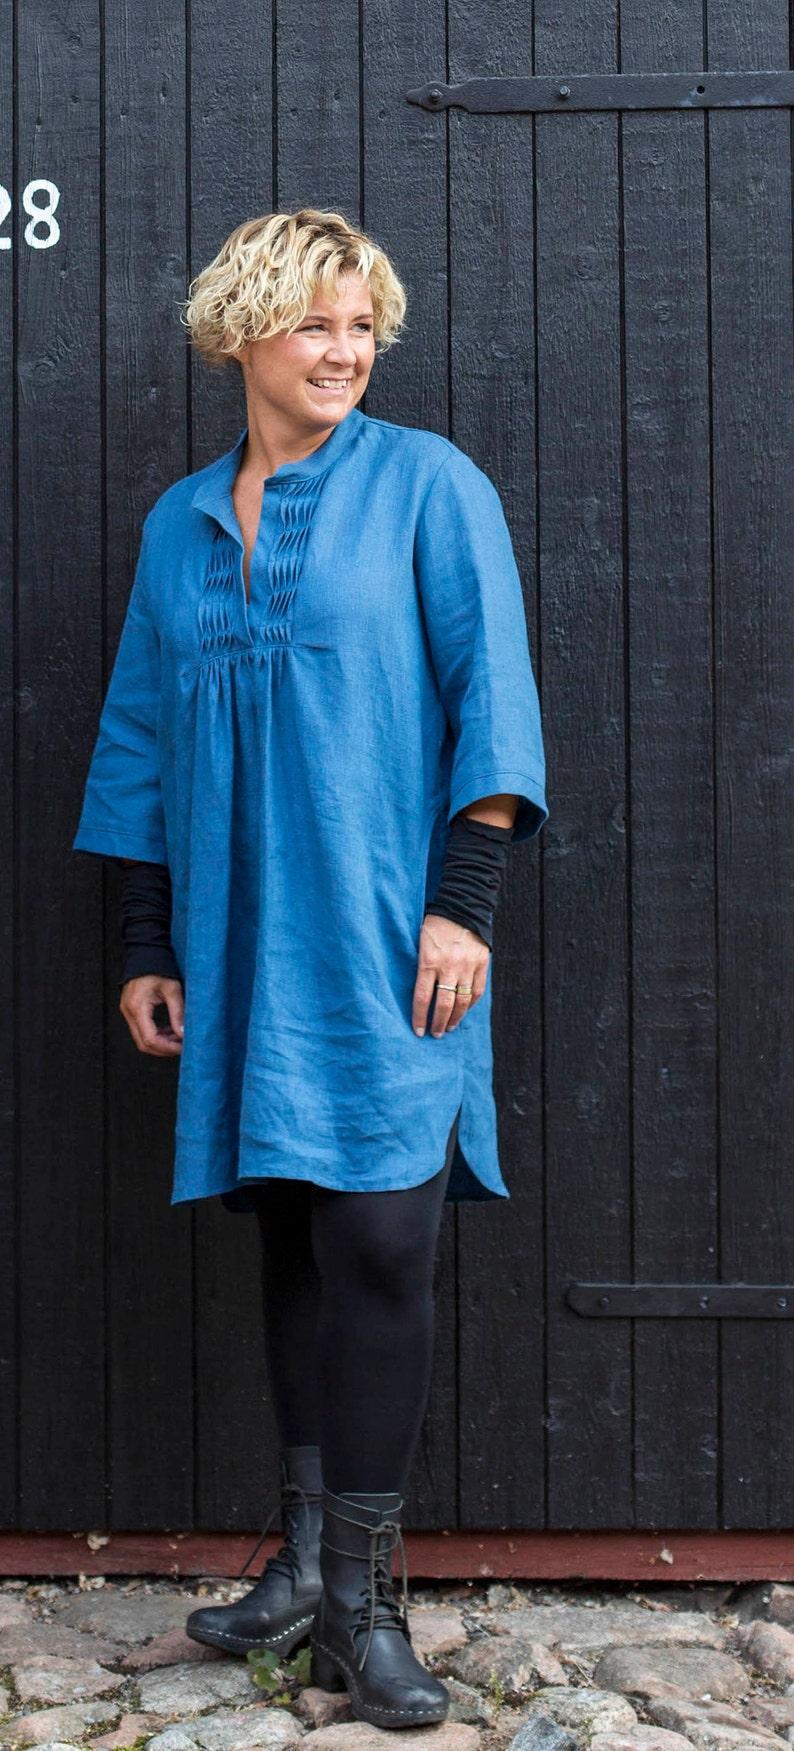 Storskjorta Lizette Paper Pattern Ladieswear Pappersm\u00f6nster Damkl\u00e4der sewing patterns